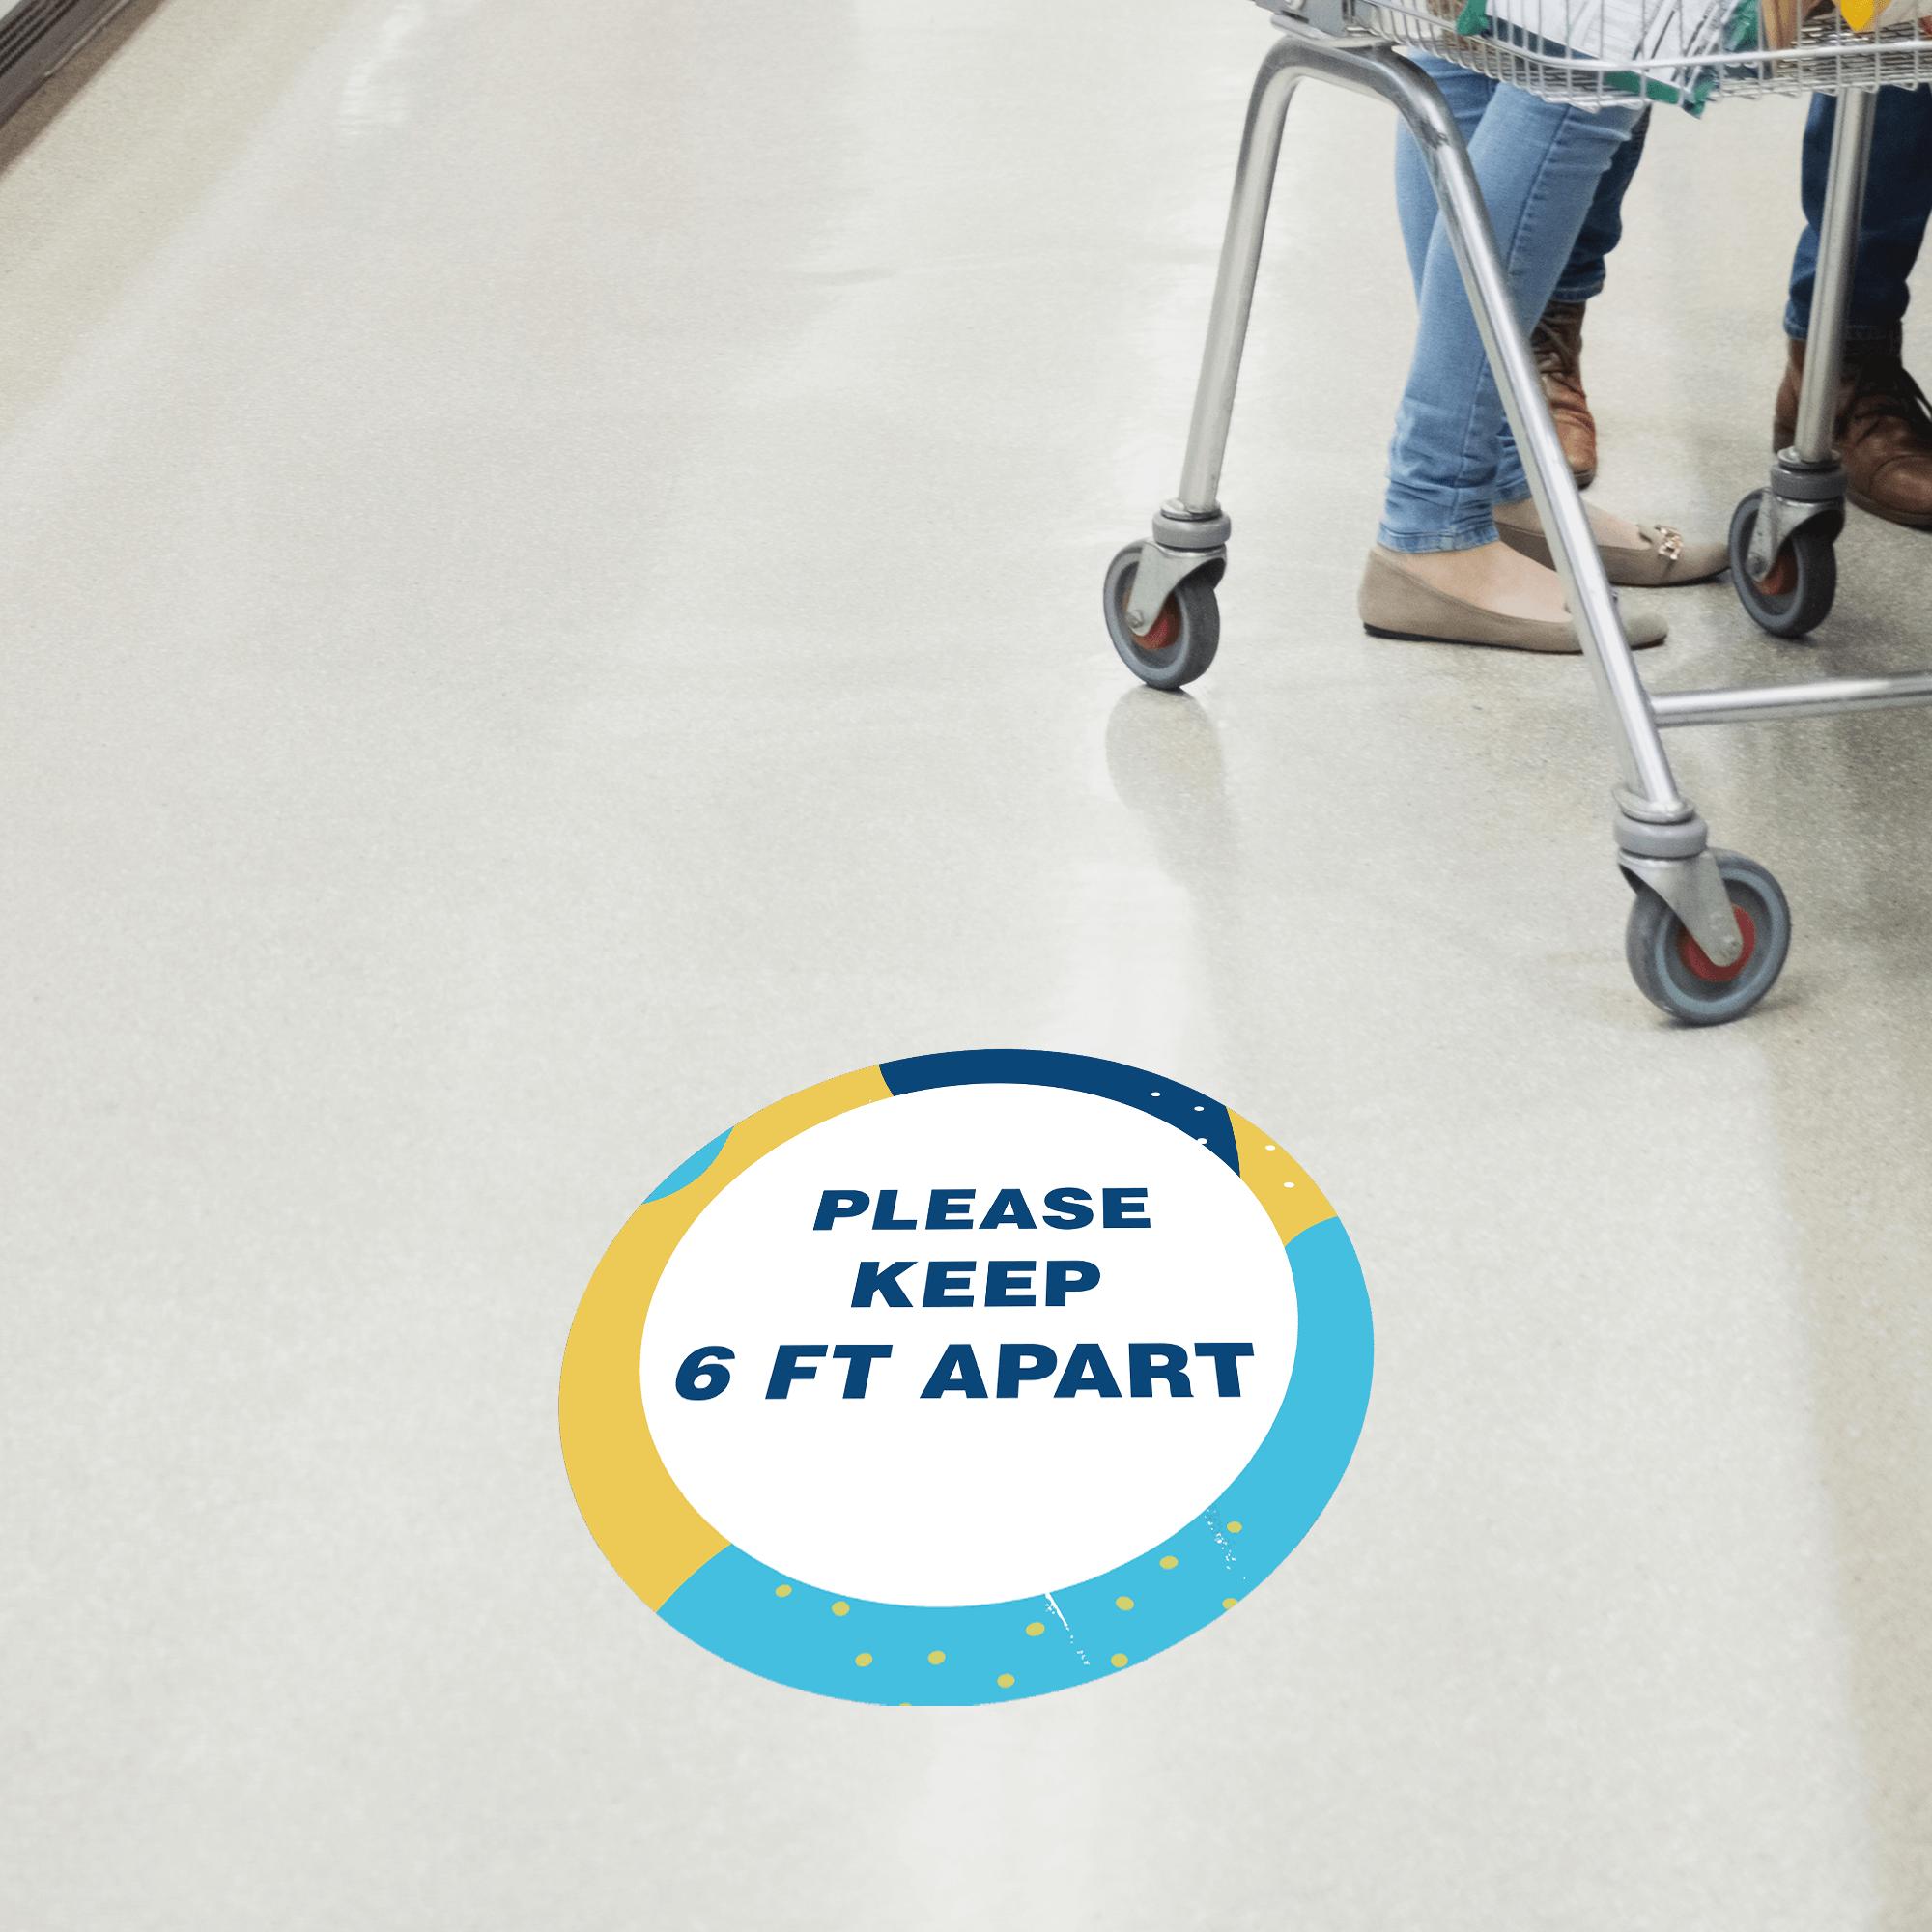 Please Keep 6 Feet Apart Aqua Set Business Reopening Floor Decal